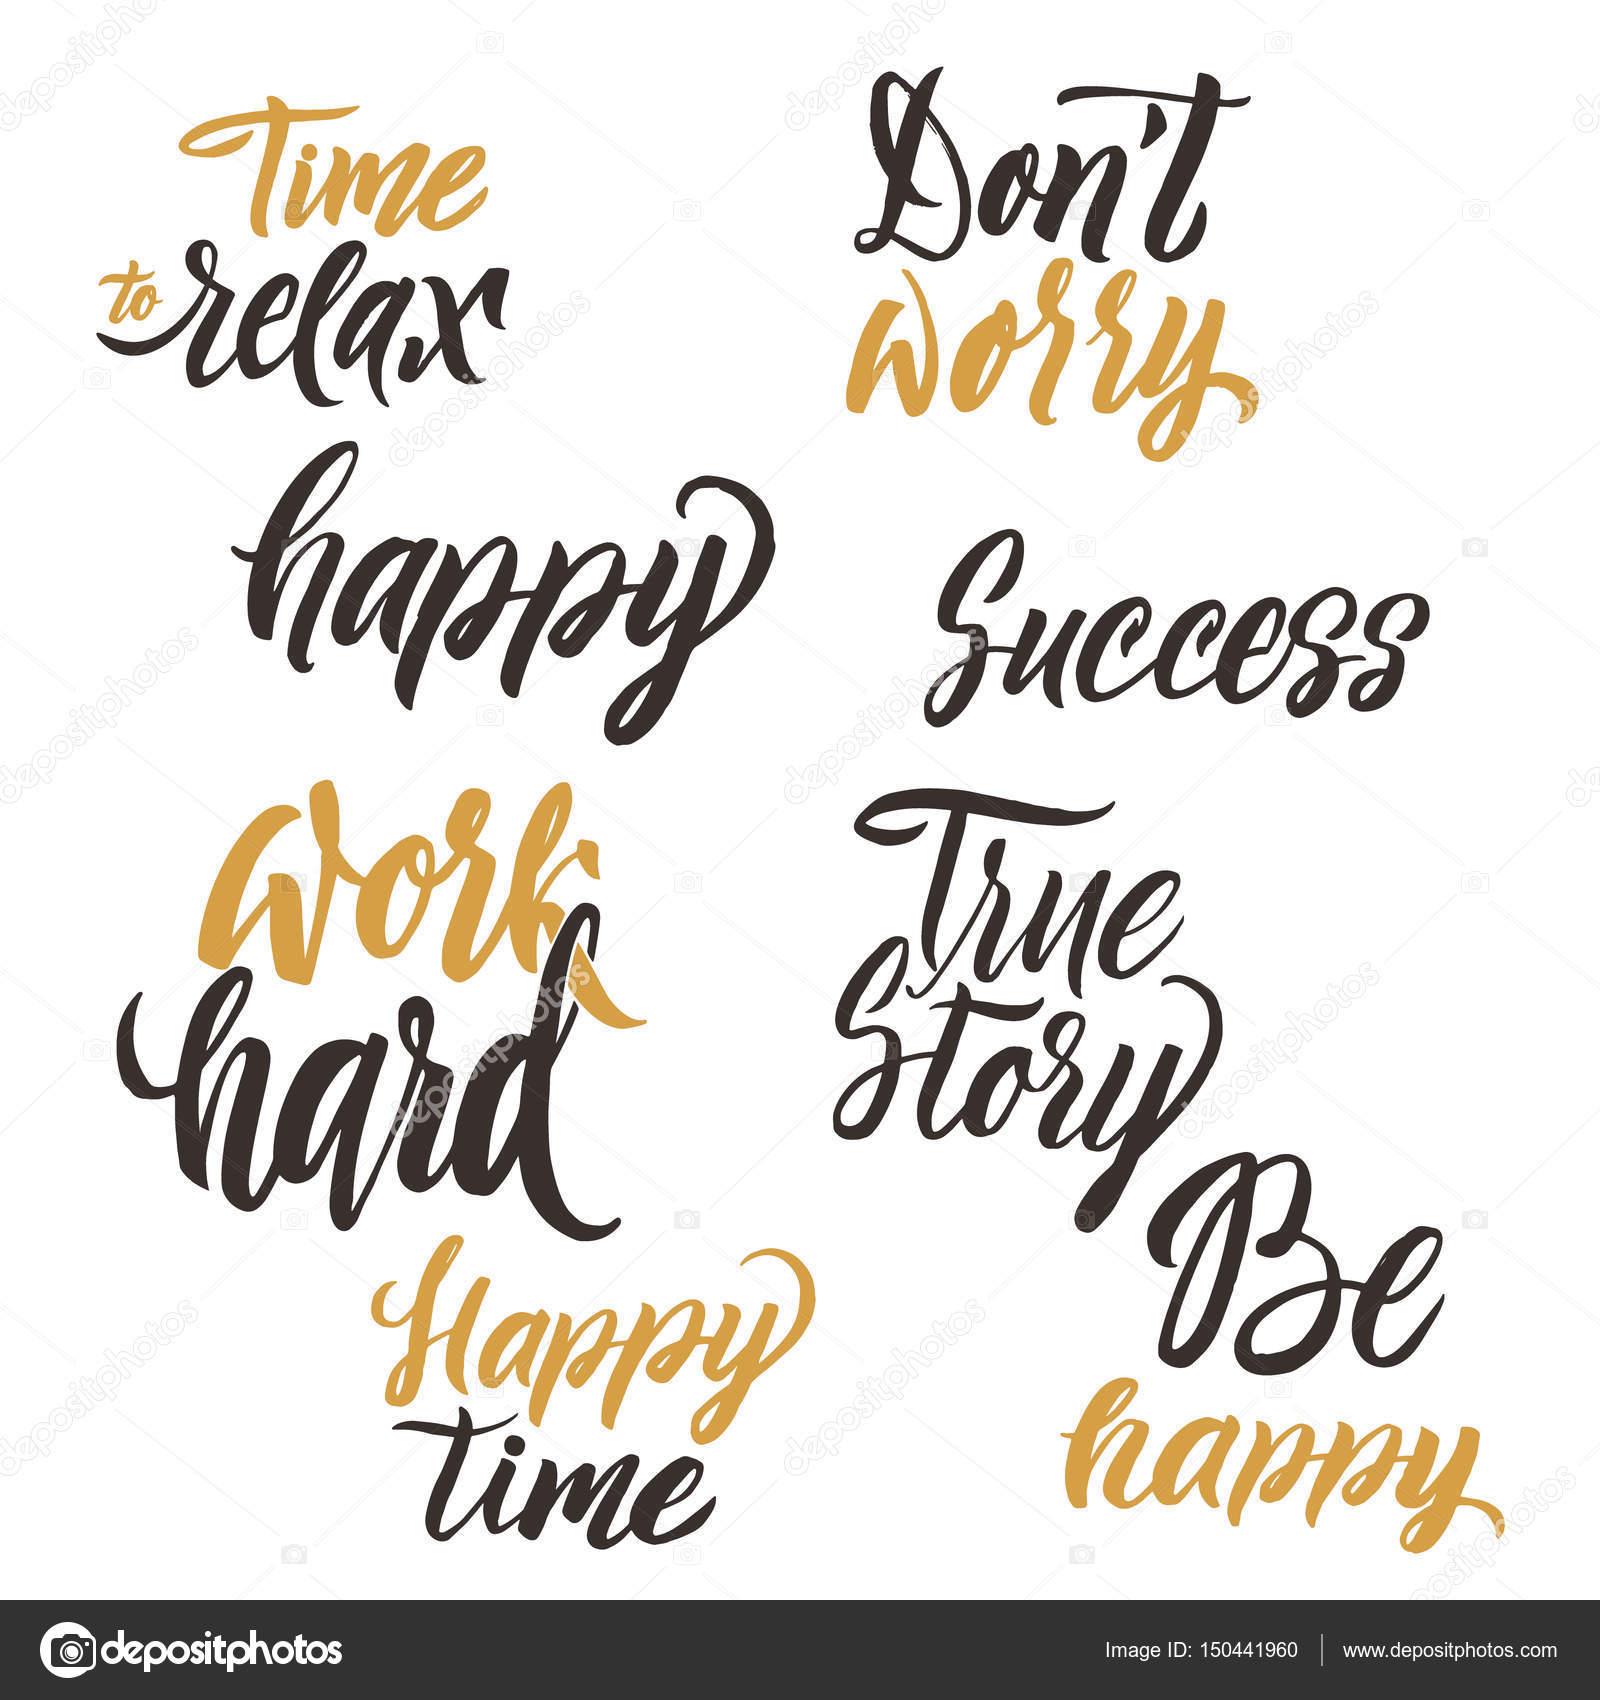 Conceitual Manuscrito Conjunto De Frases Ou Palavras Cartaz